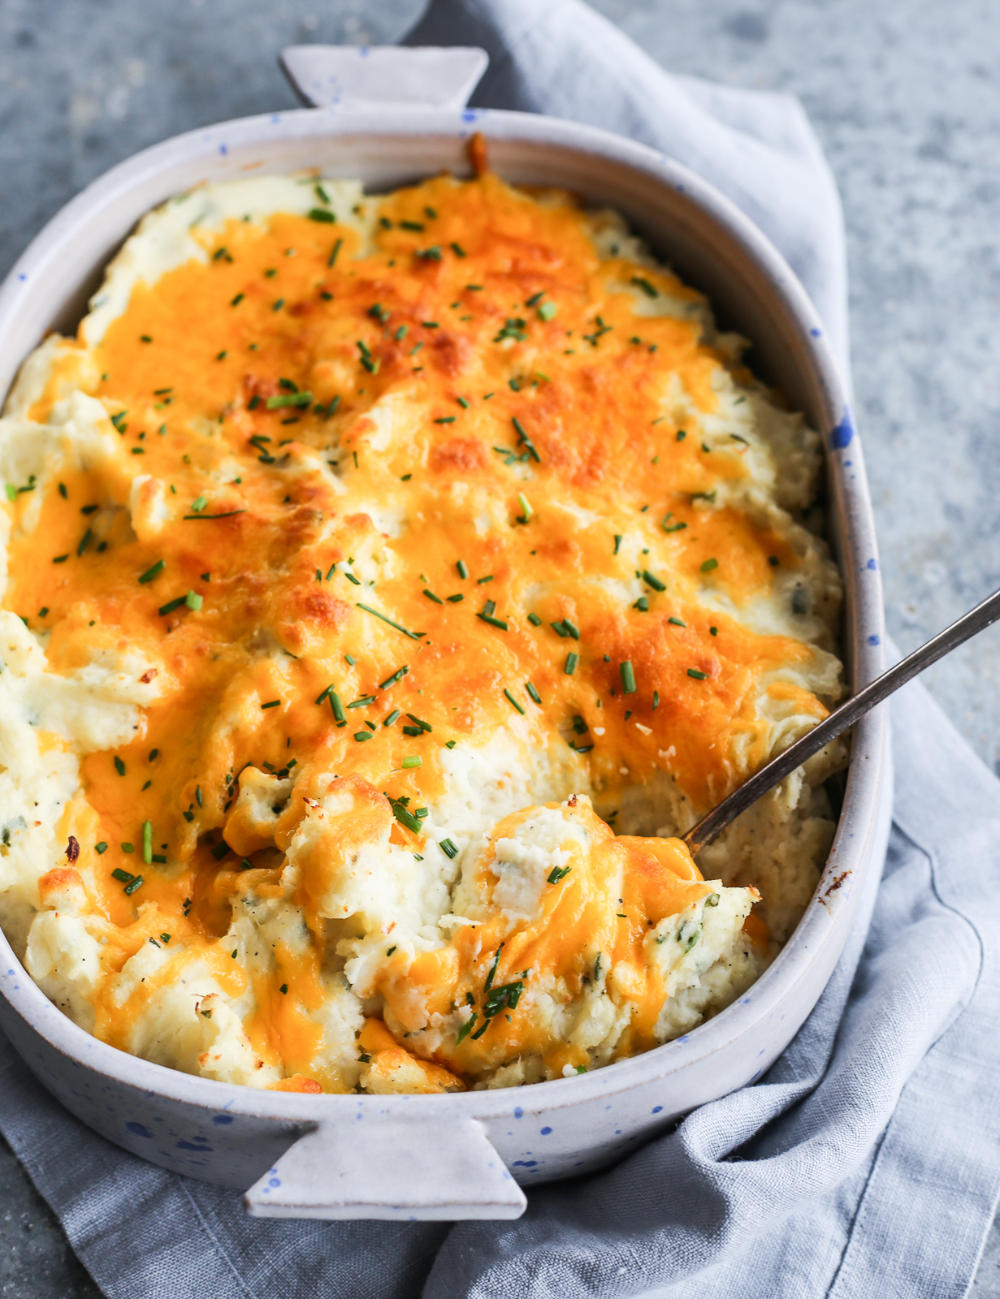 Sour Cream And Onion Potato Bake The Defined Dish Recipe Potato Side Dishes Sour Cream Potatoes Potato Sides